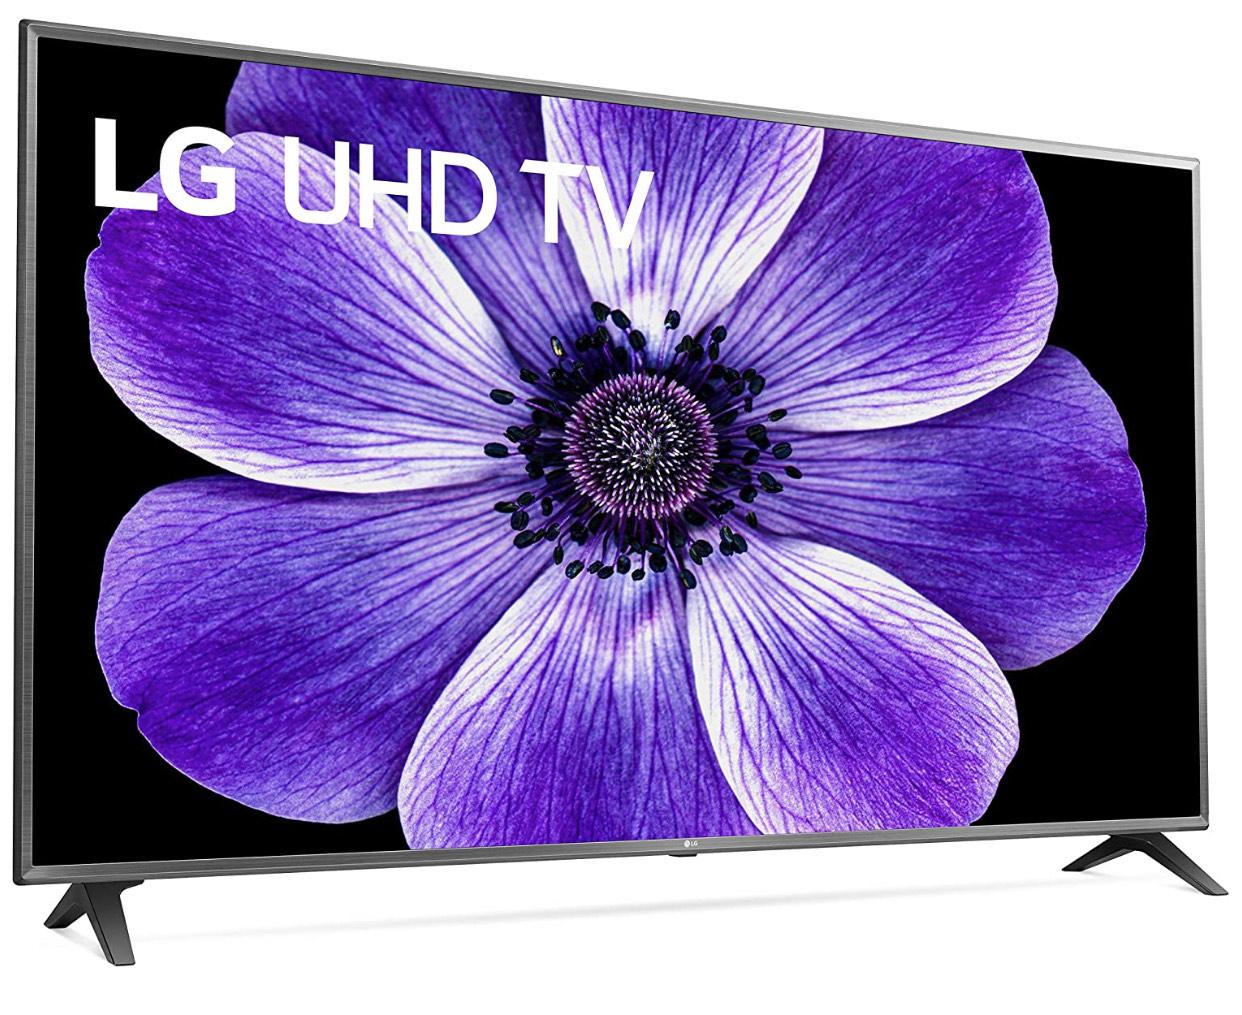 [Mediamarkt] LG 75UN71006LC LED TV (75 Zoll, Triple Tuner, Smart TV, HDR 10 Pro, HLG) für 895,- ( Lokal Buxtehude )